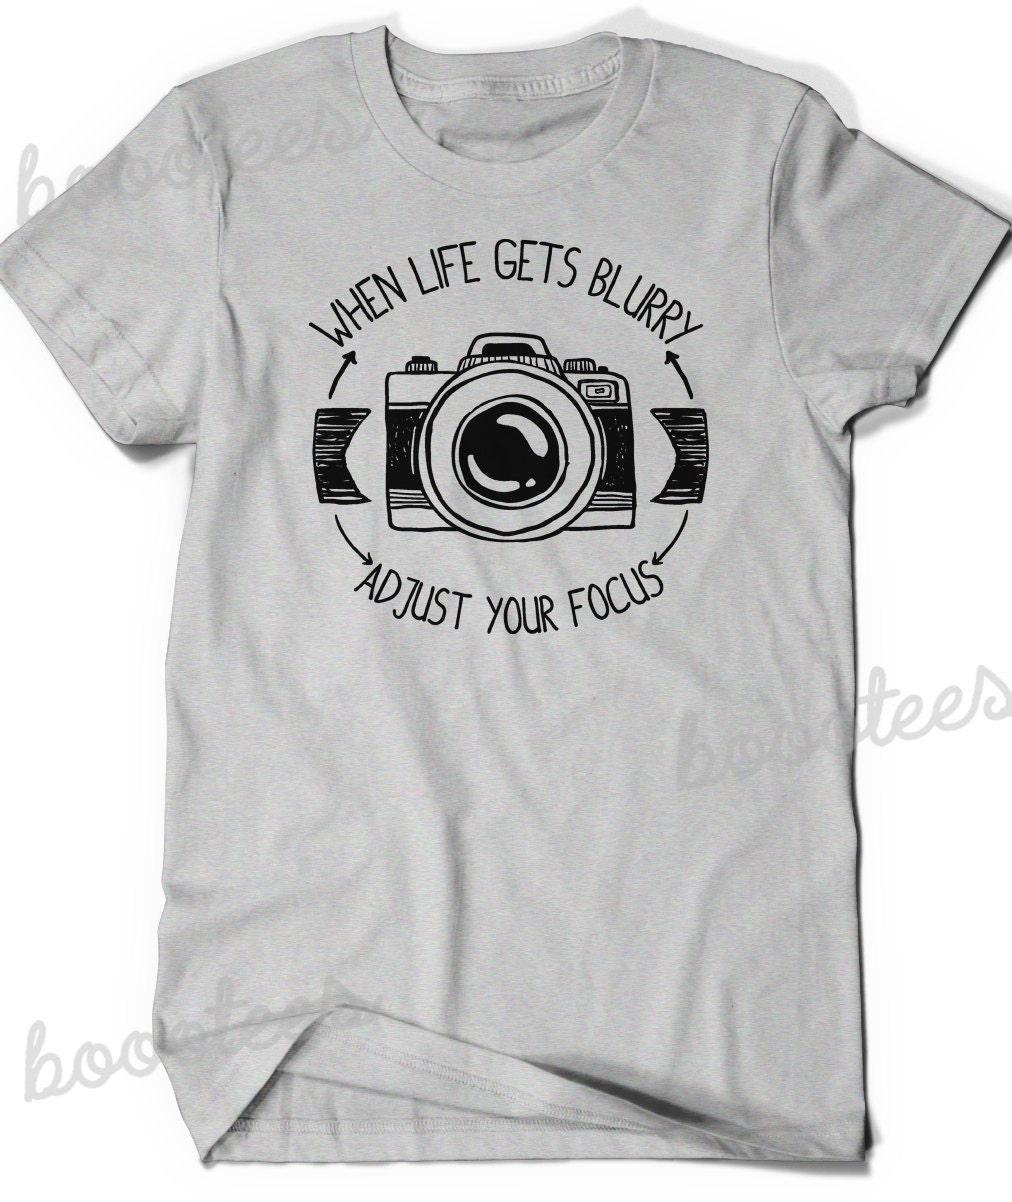 Photographer T-Shirt Unisex T-shirt Photographer Gift Big Cheese Shirt Photographer Shirt The Big Cheese Funny T-shirt